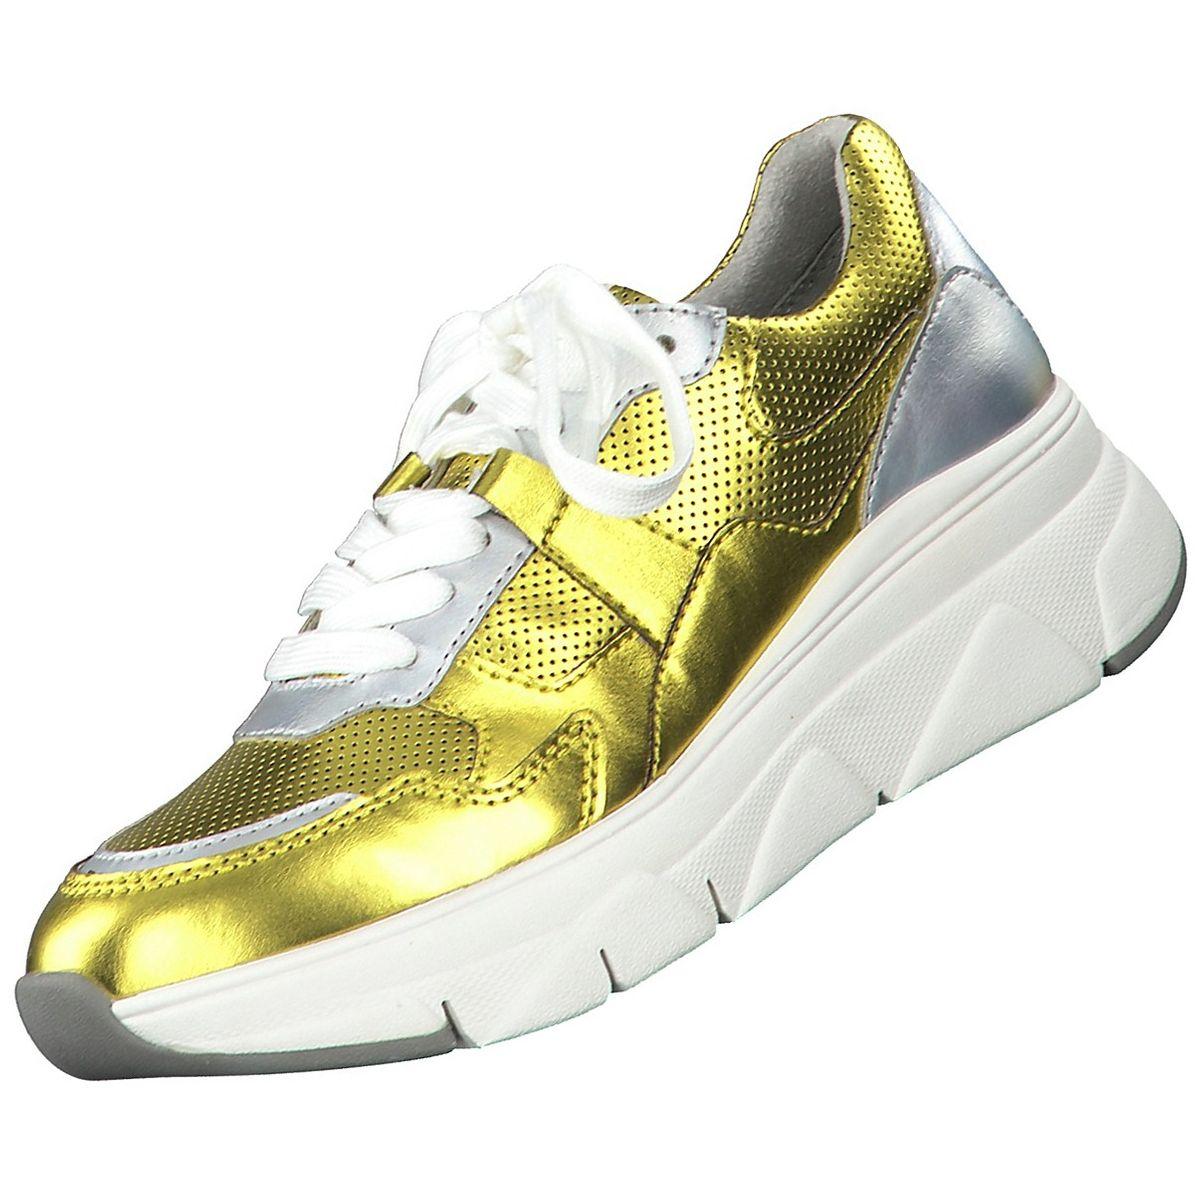 TAMARIS Damen Sneaker Gelb Metallic | Trendbereich